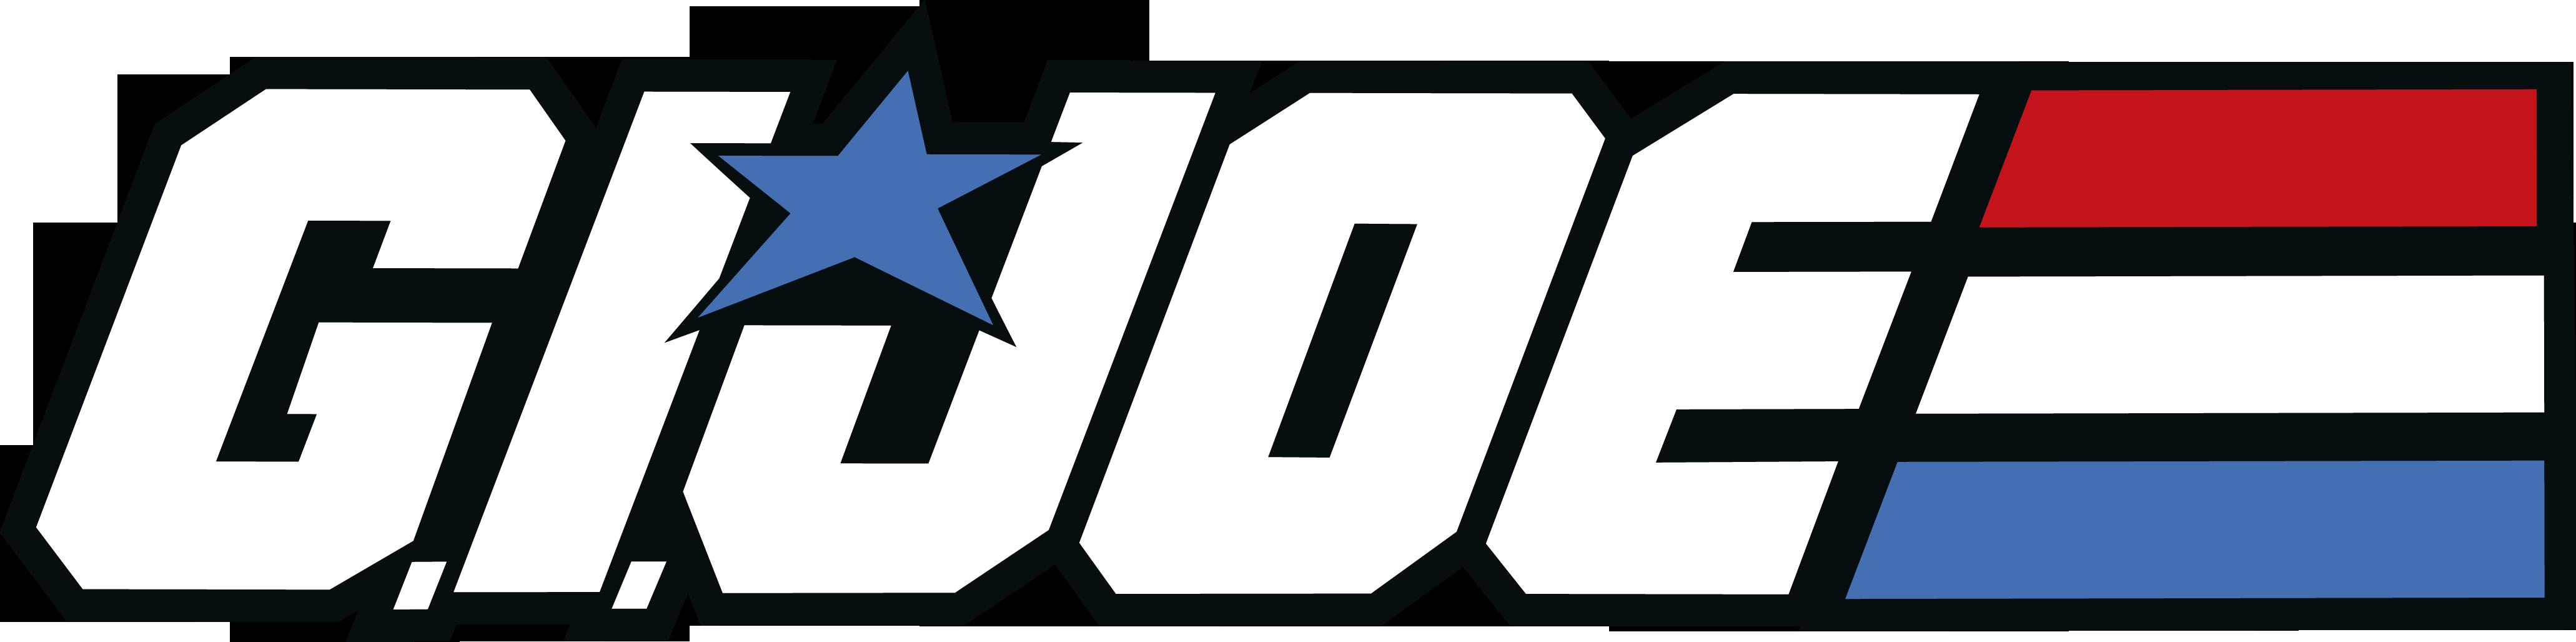 G.I. Joe (franquicia)